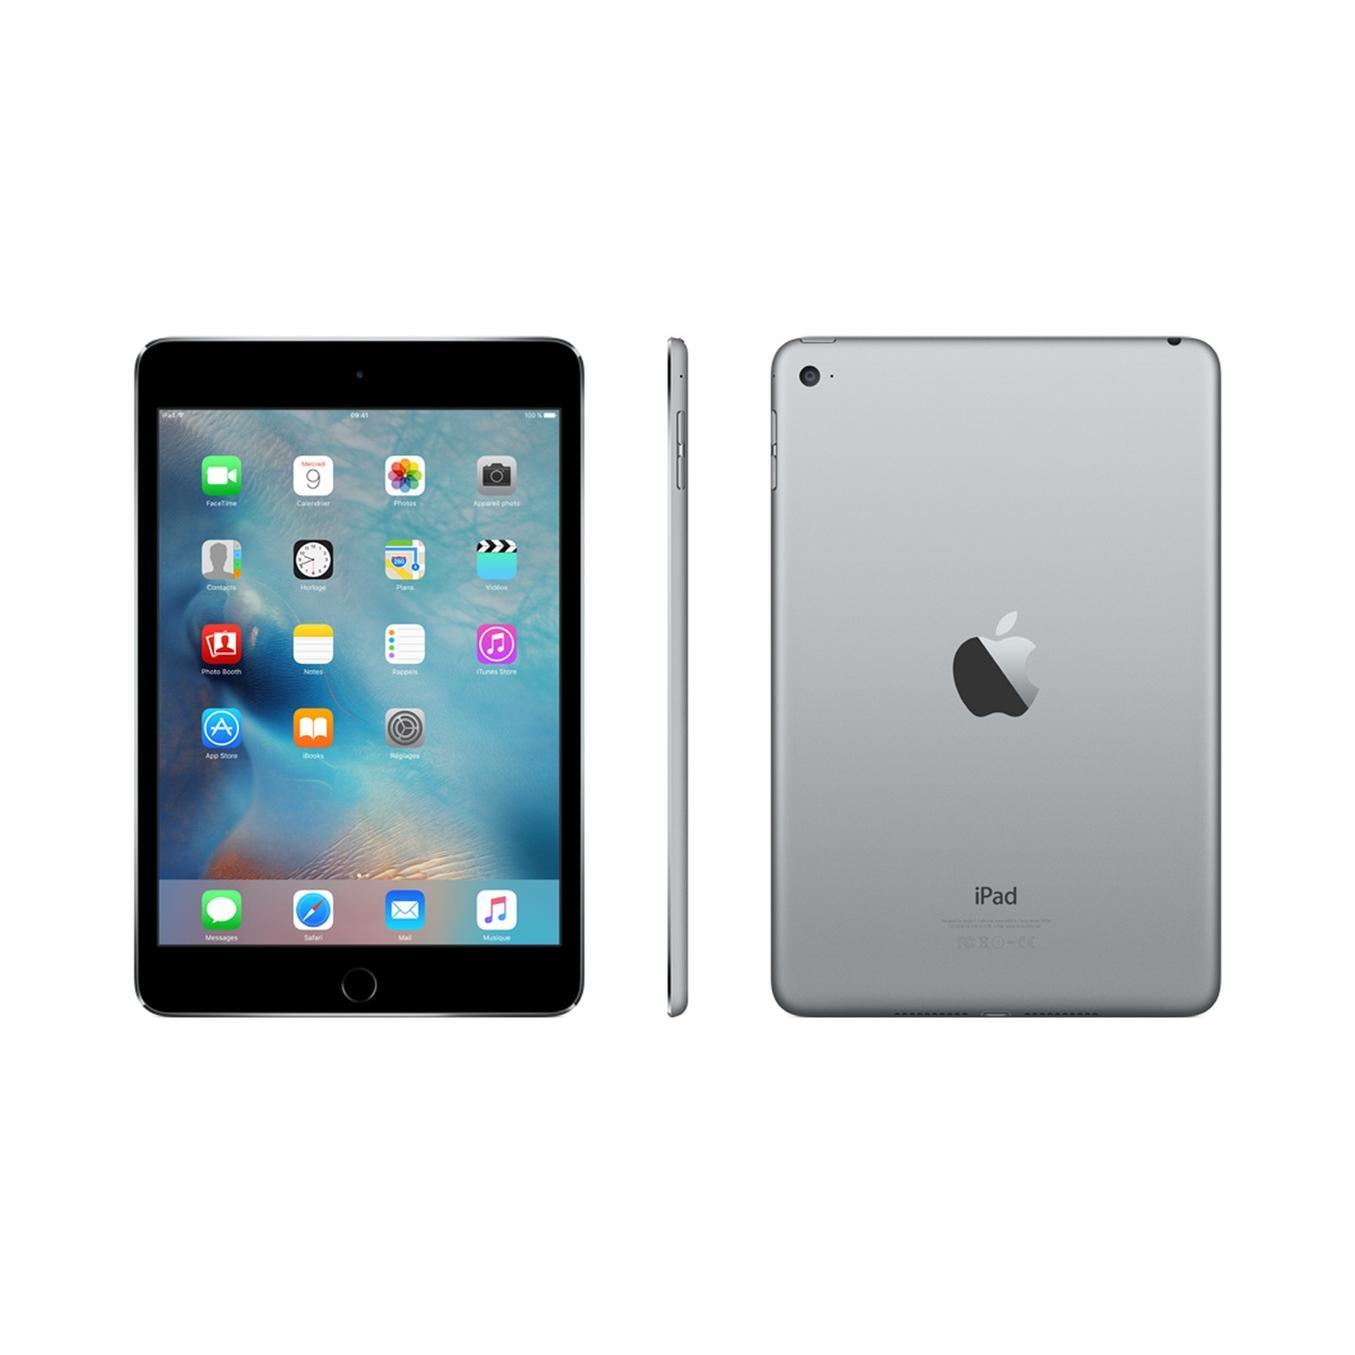 iPad mini 4 64 Go - Wifi - Gris sidéral